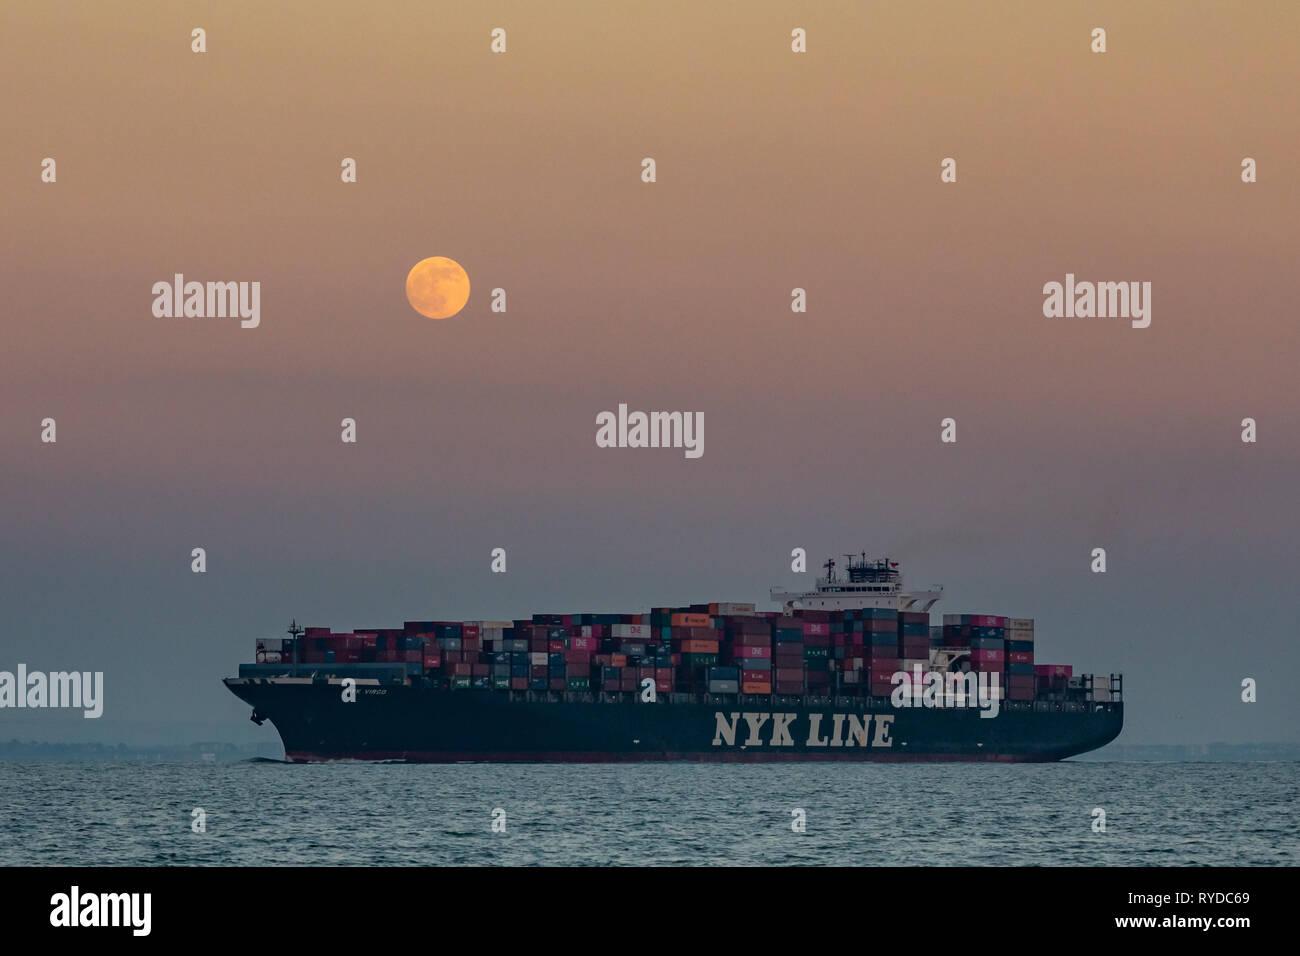 Cargo Ship under a Full Moon - Stock Image